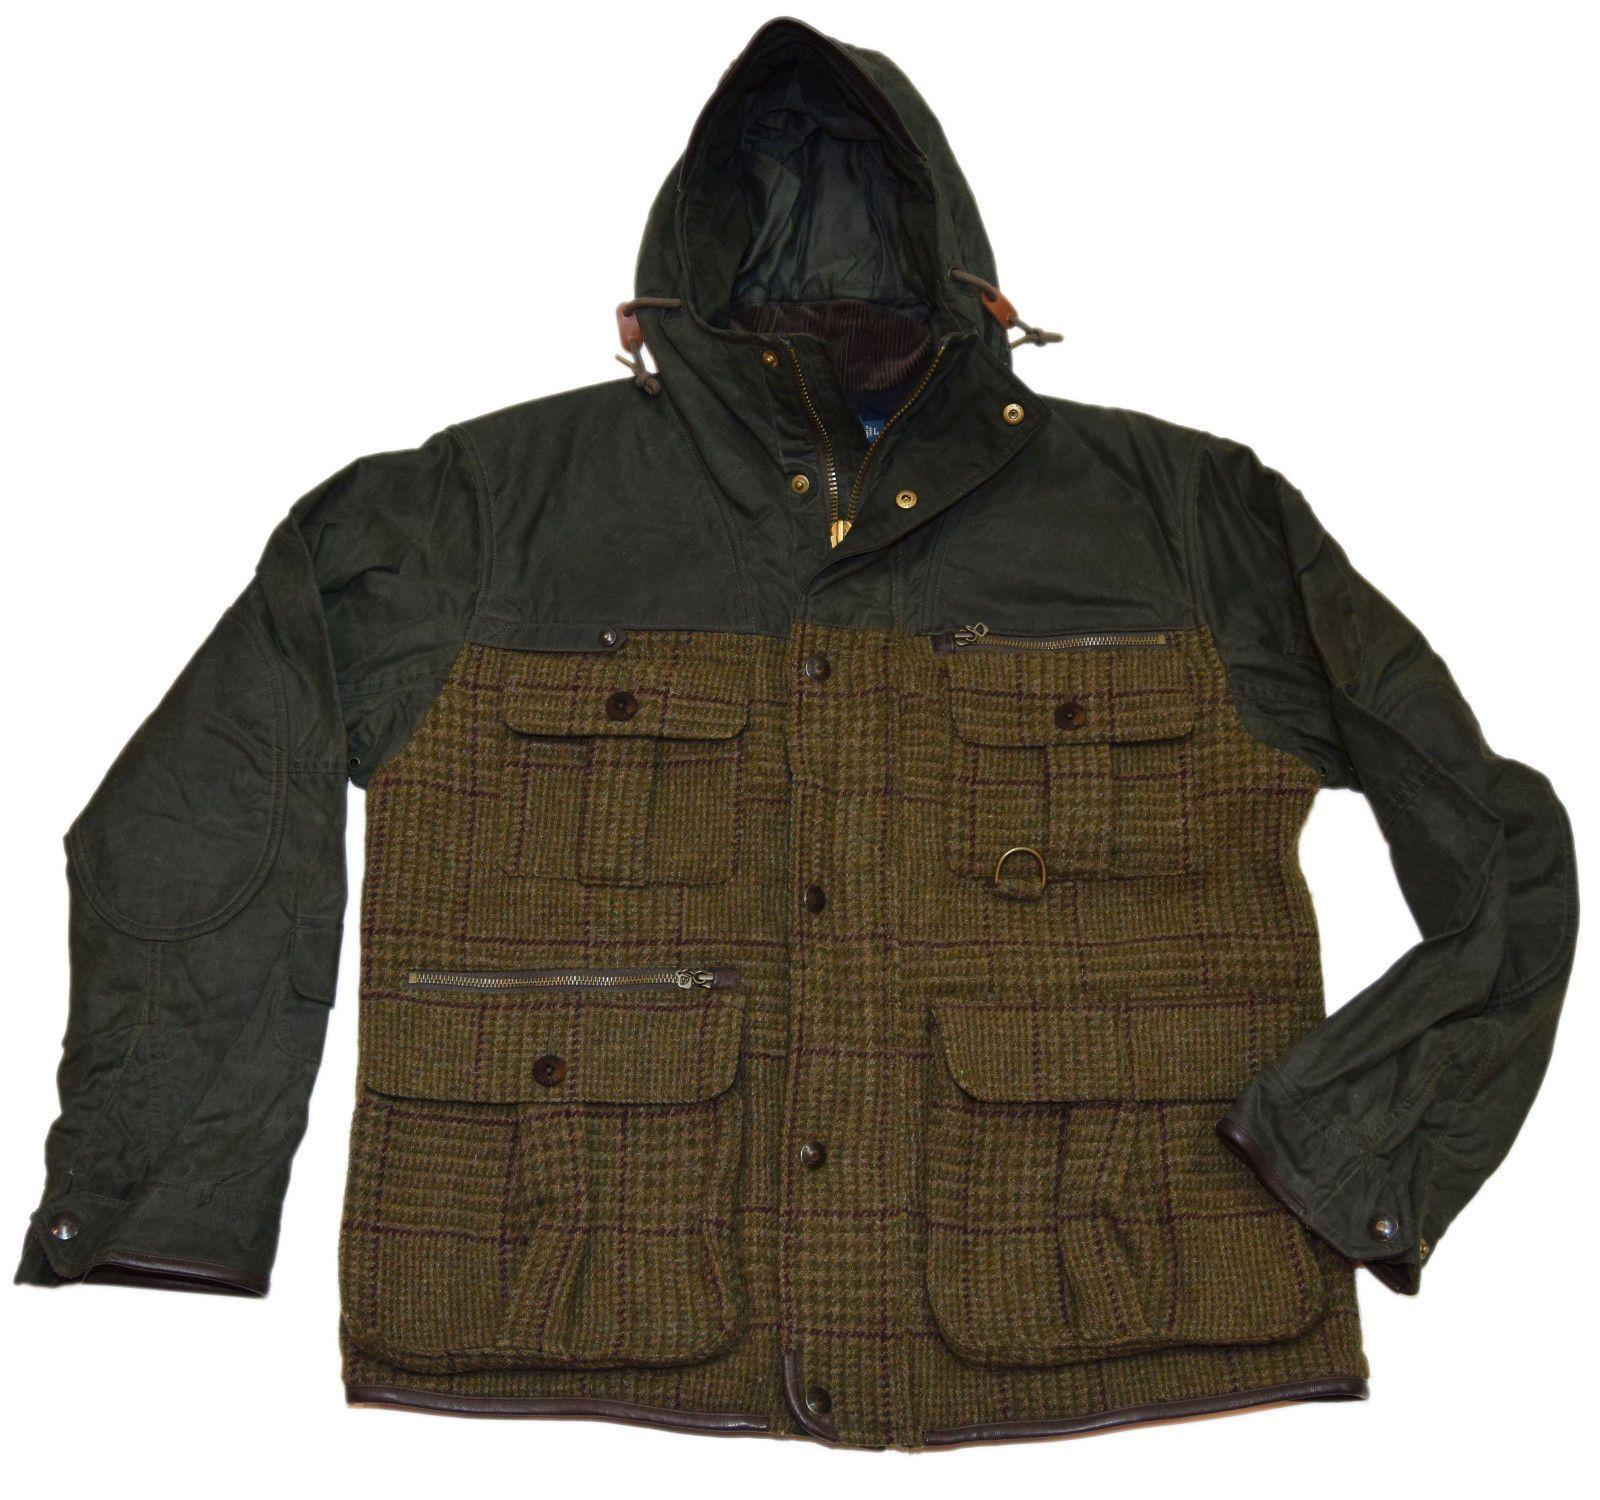 Polo Ralph Lauren Mens Wool Leather Hooded Jacket Coat